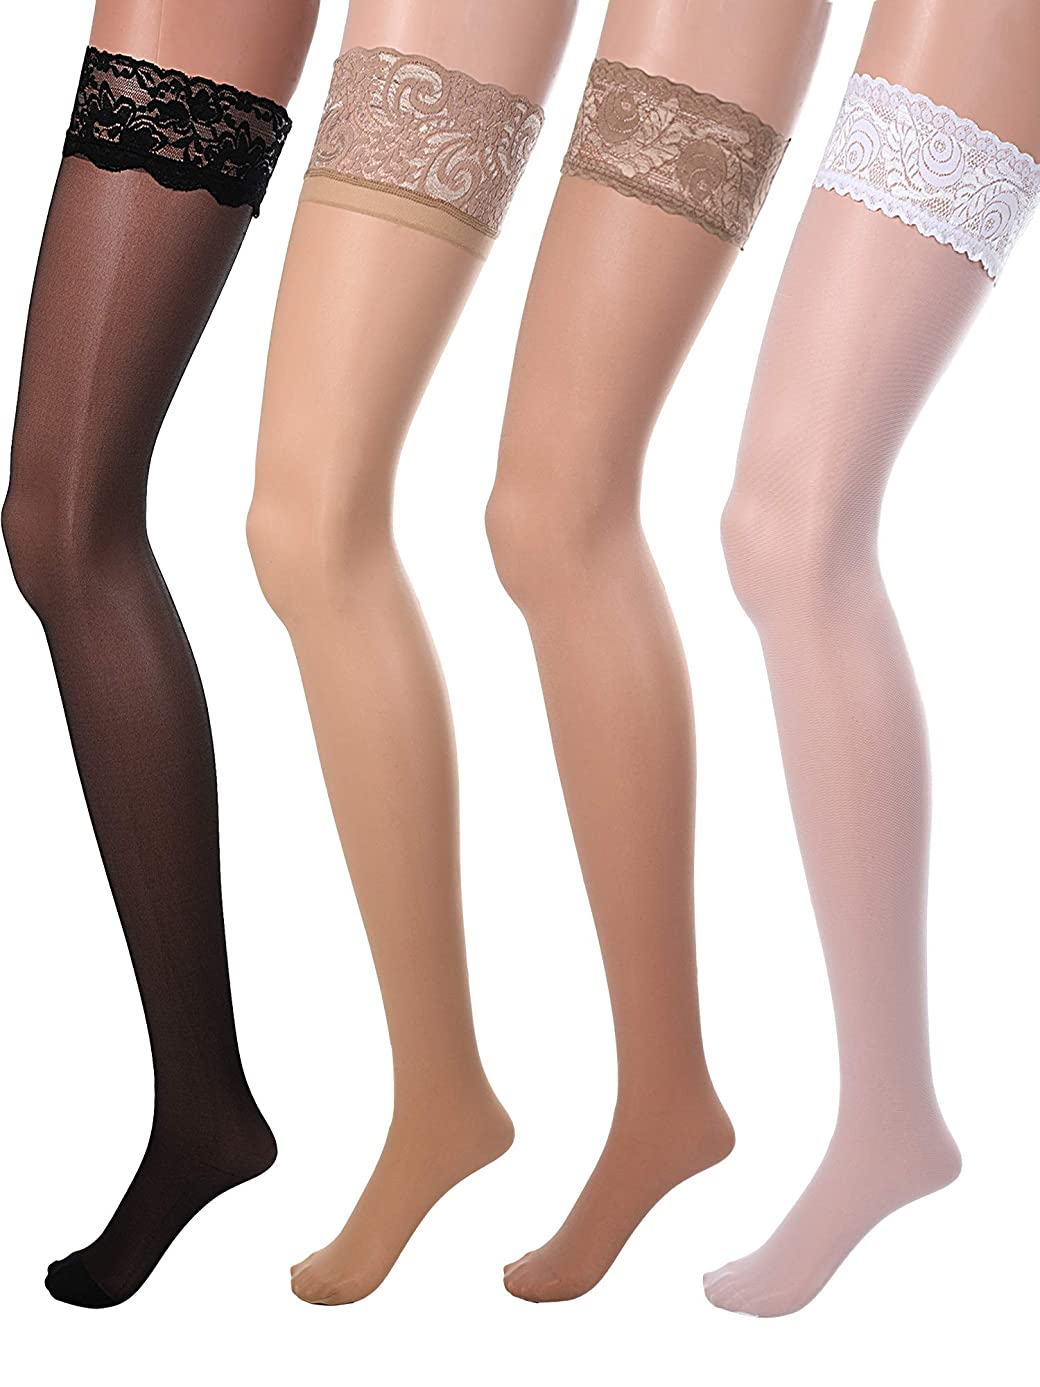 4 Pairs Women Fishnet Stockings Black Sheer Lace Thigh High Stockings High Waist Tights